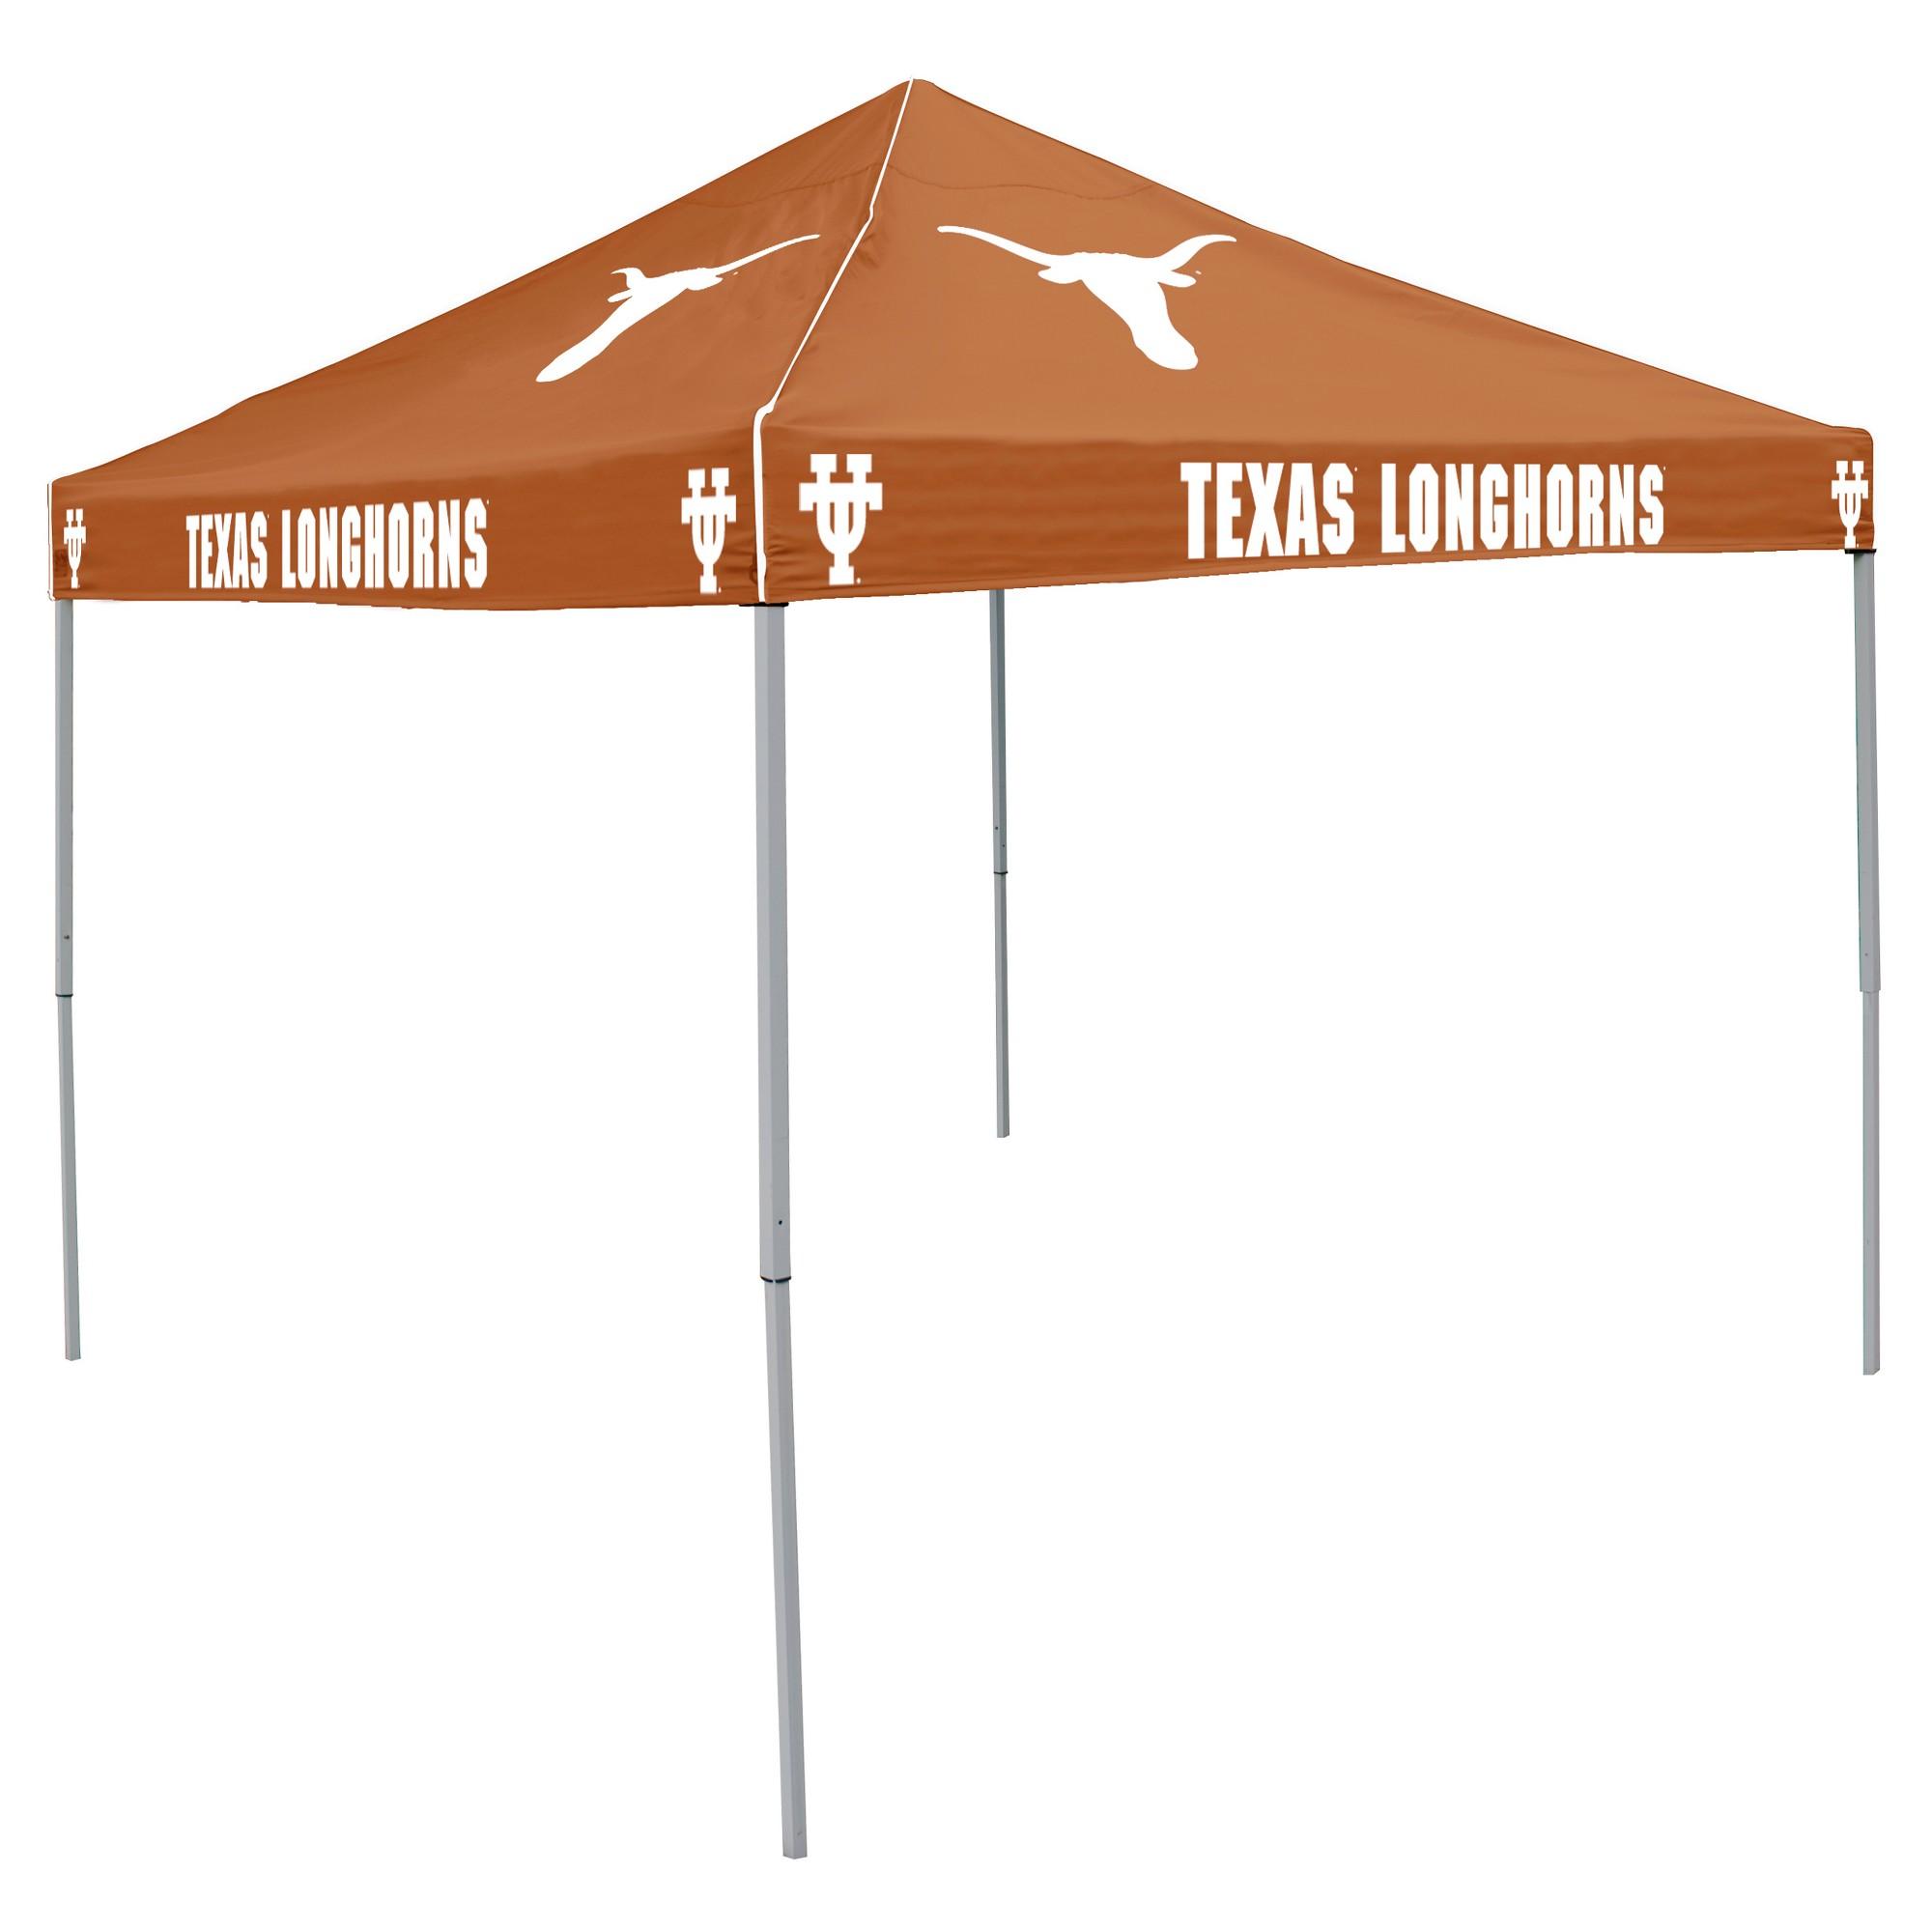 NCAA Texas Longhorns Logo Brands 9x9 Canopy Tent  sc 1 st  Pinterest & NCAA Texas Longhorns Logo Brands 9x9 Canopy Tent | Canopy tent ...